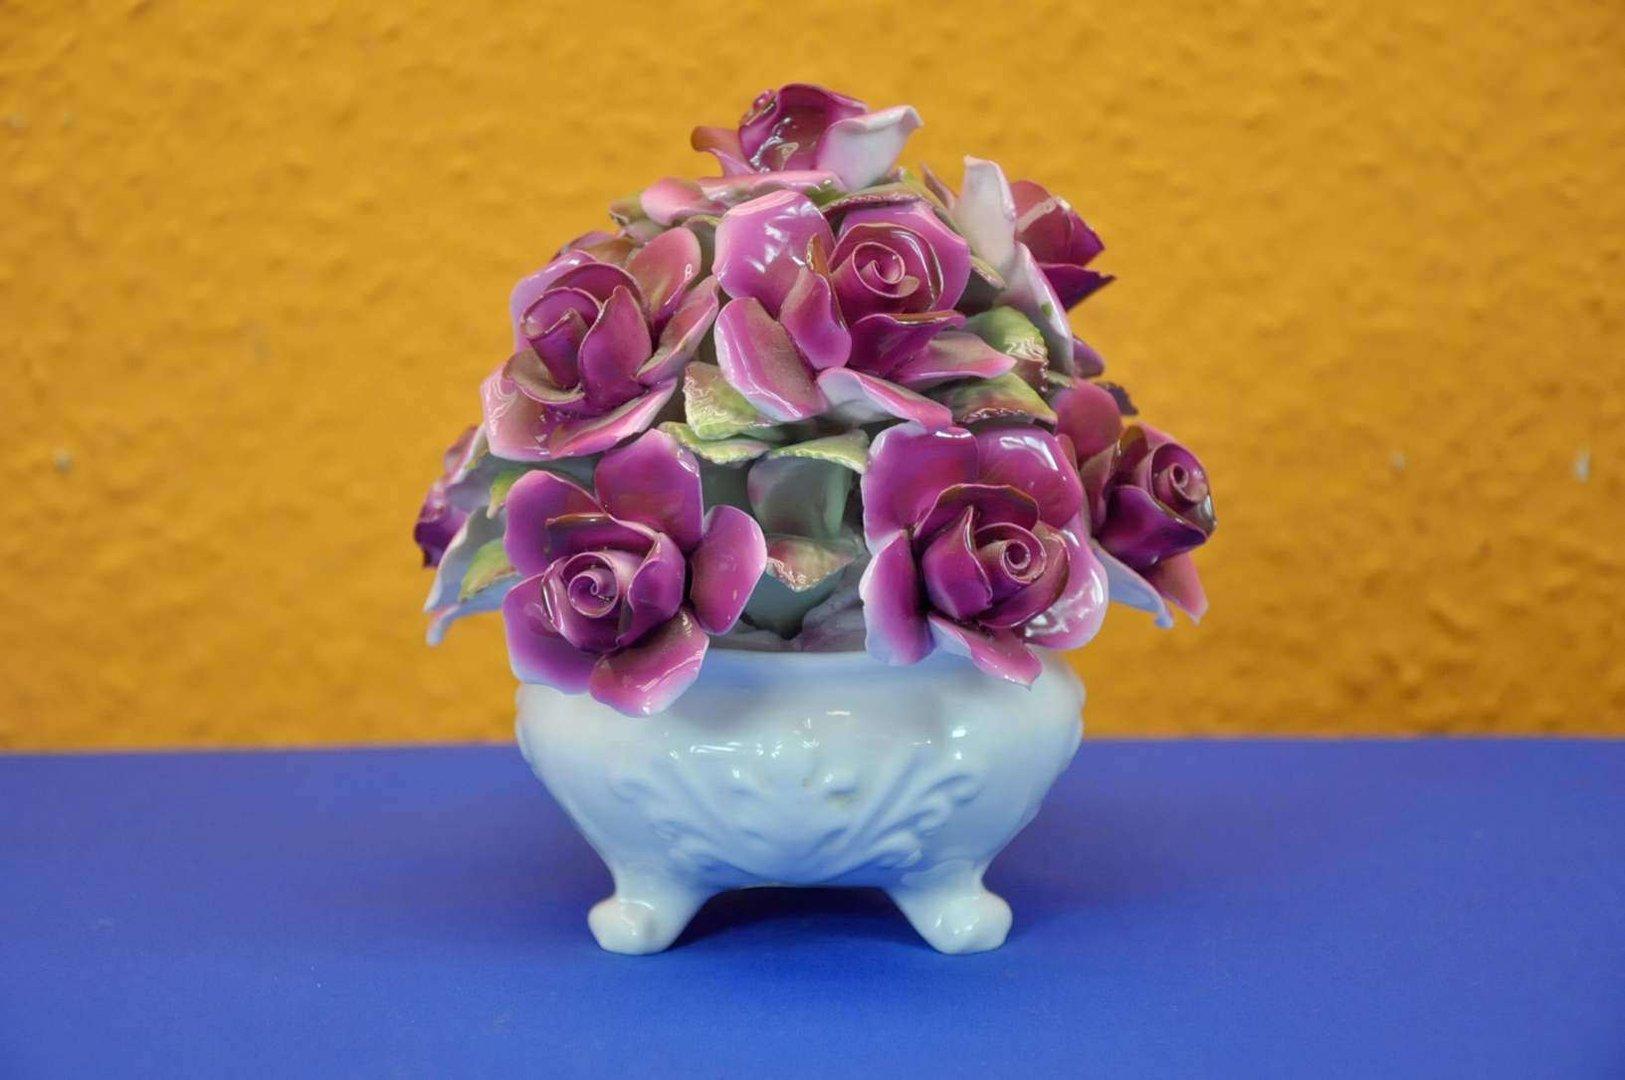 staffordshire rosen bukett gro paridom exclusive bei kusera. Black Bedroom Furniture Sets. Home Design Ideas